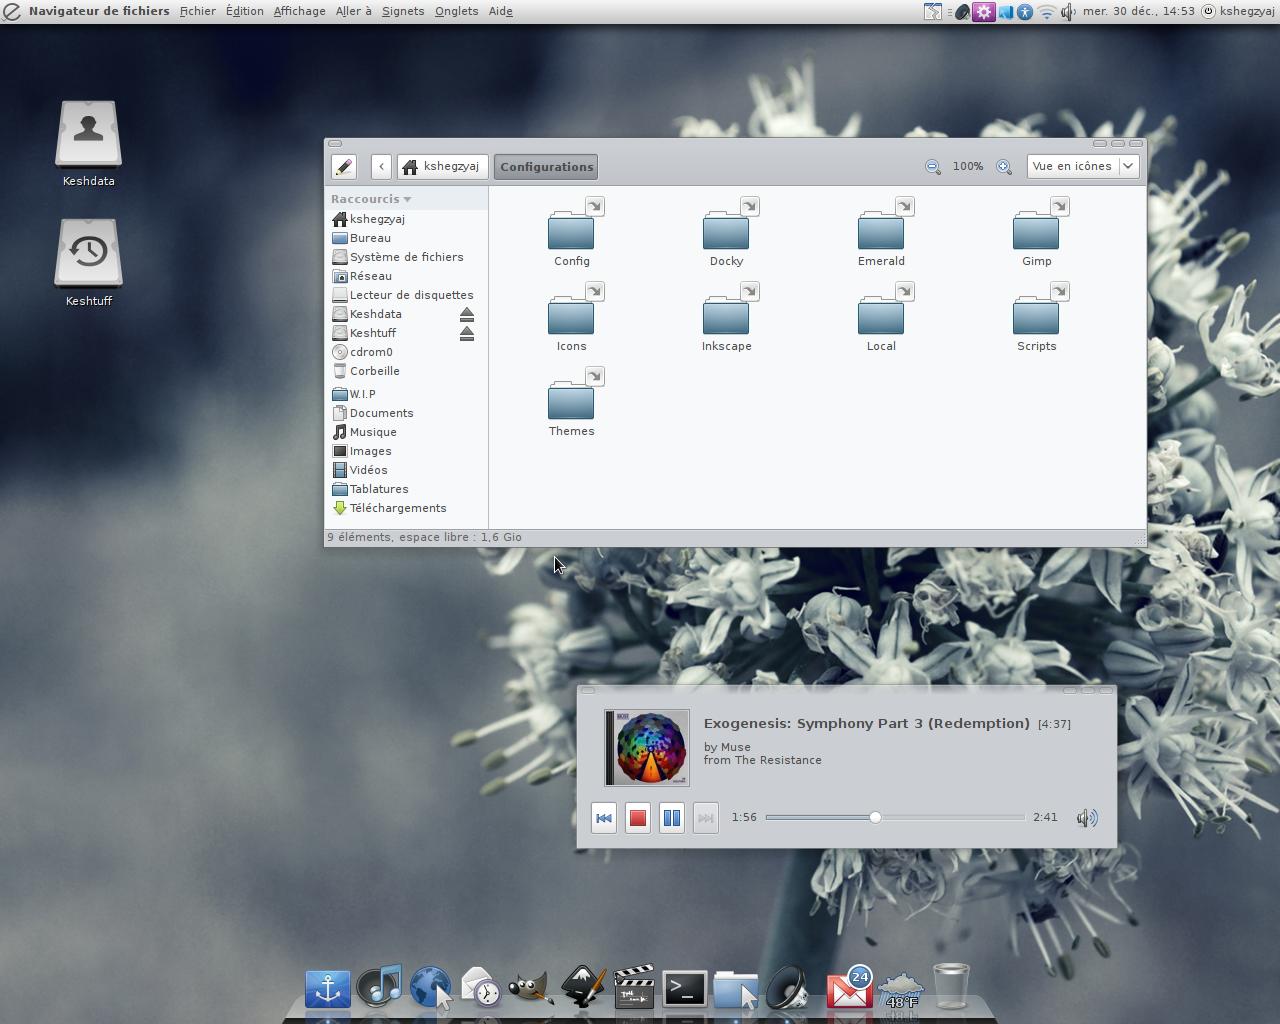 Similiar Desktop by Kshegzyaj